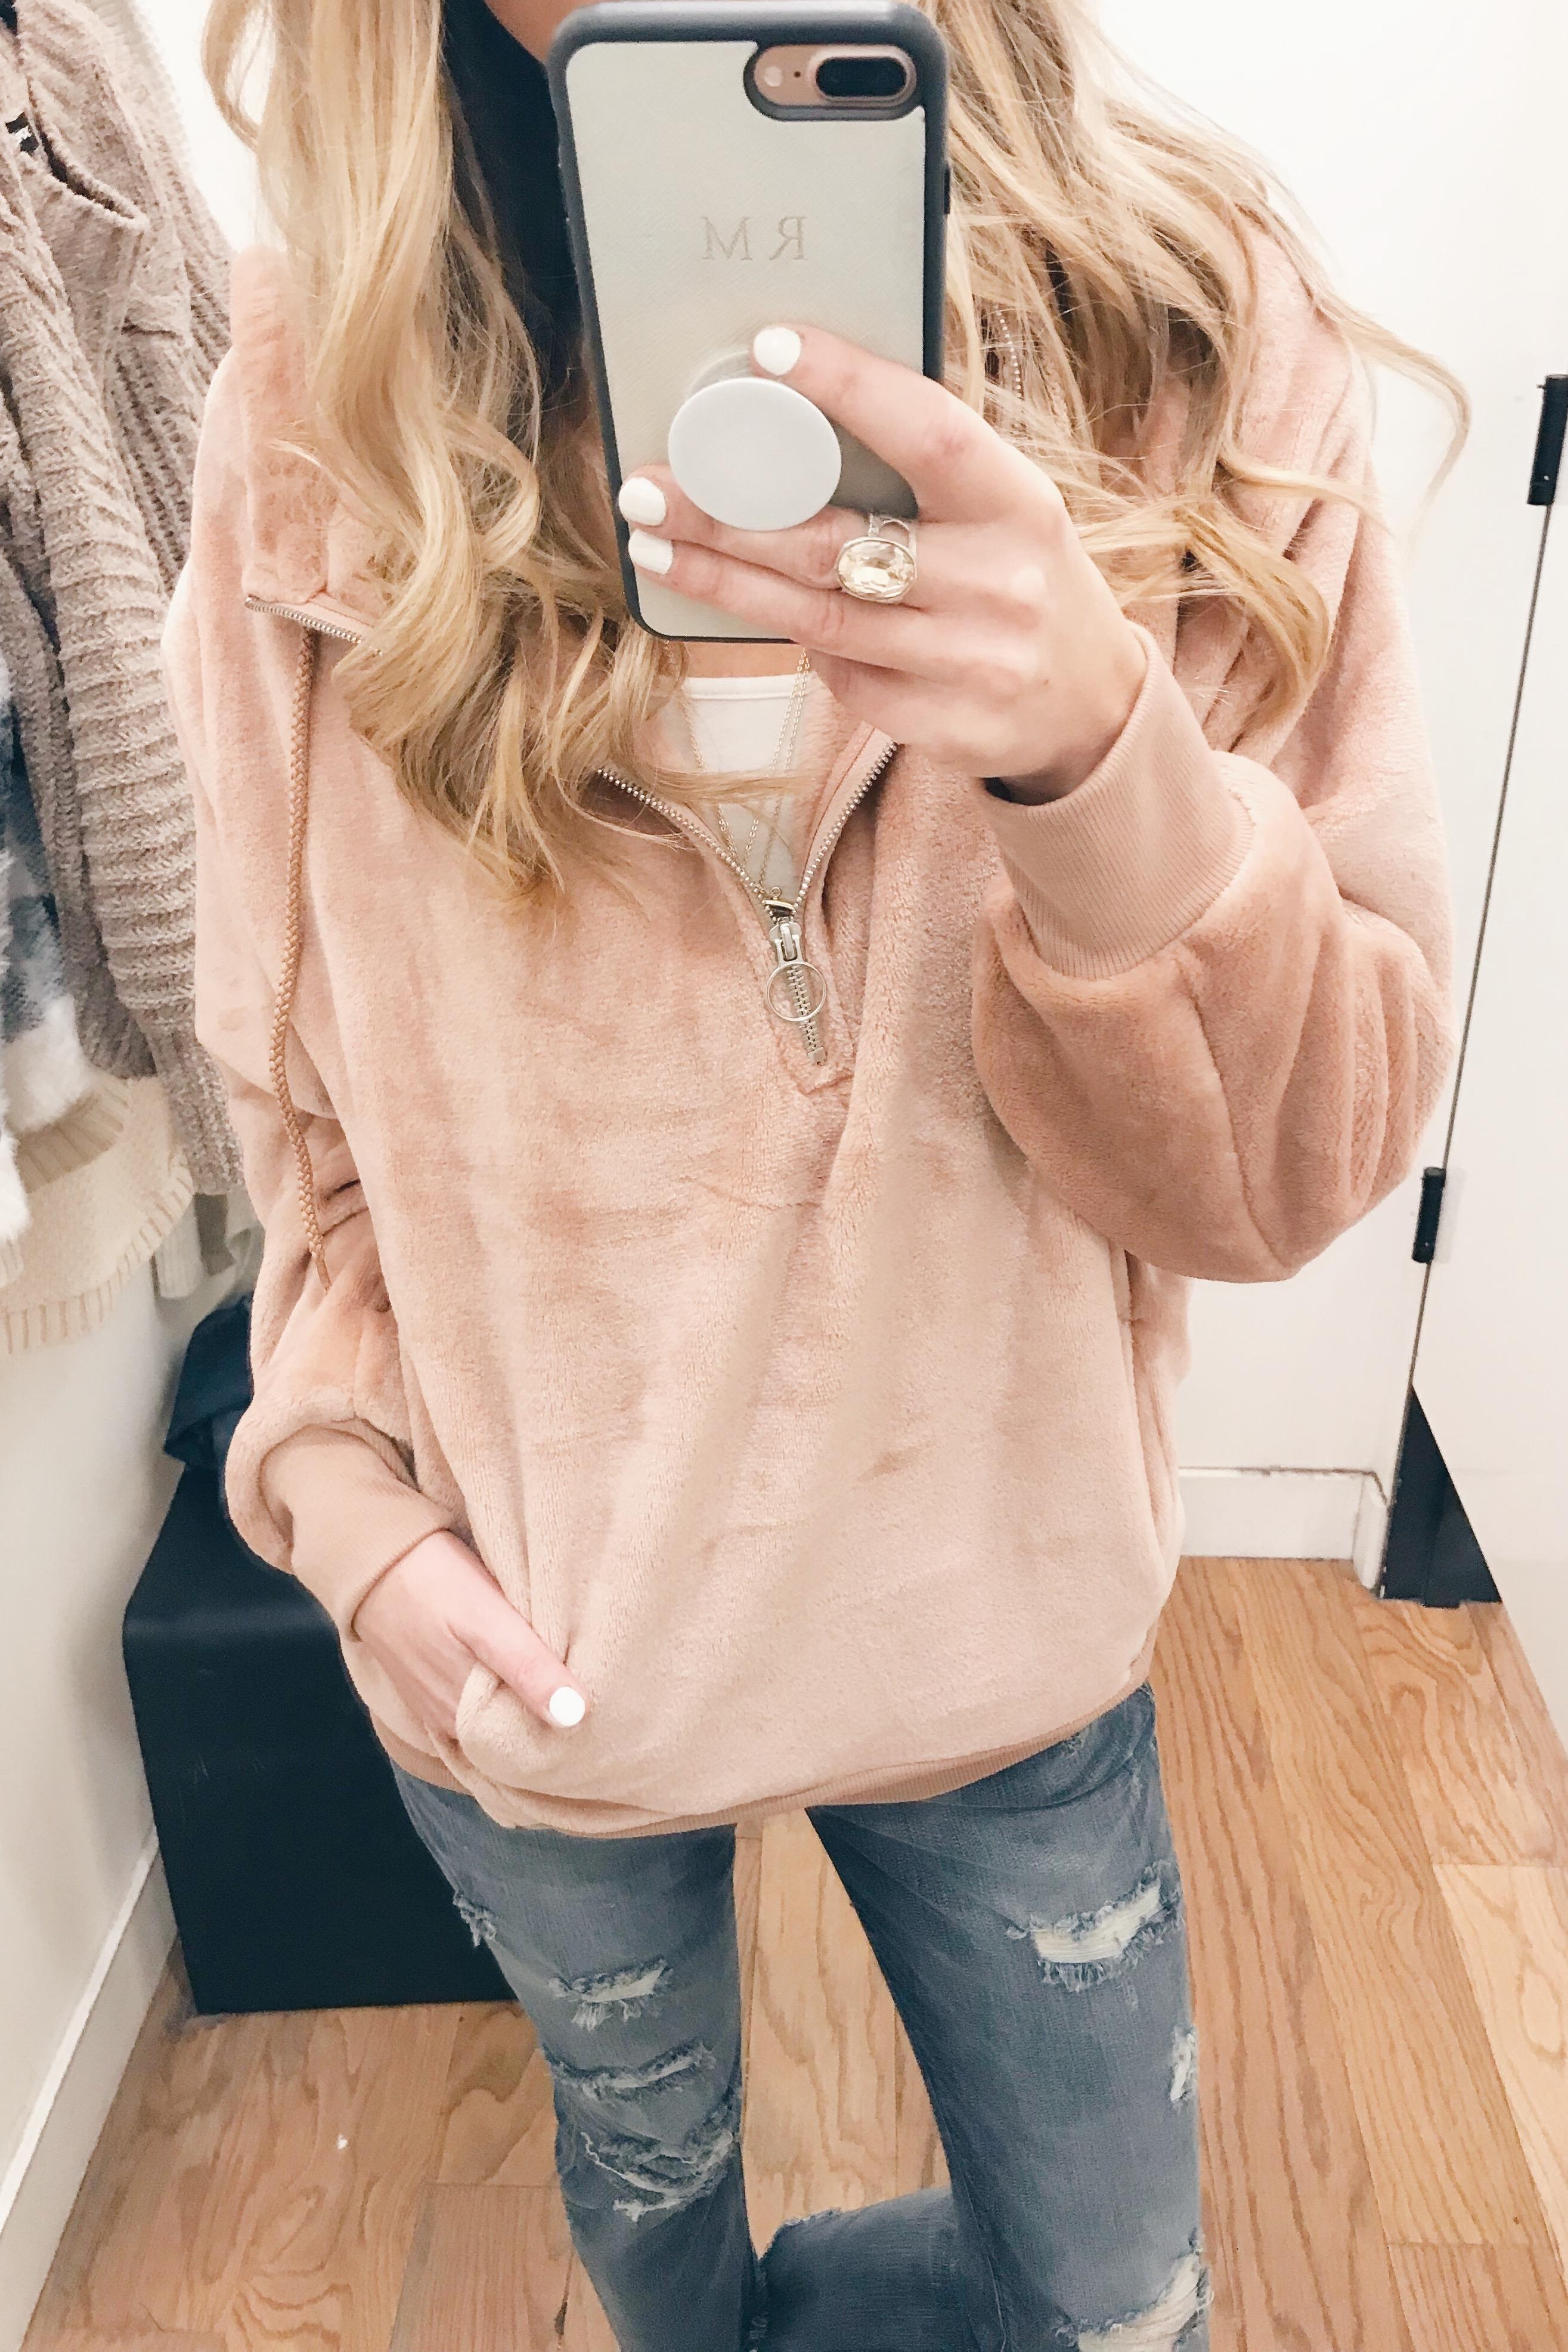 veteran's day weekend sale round up 2018 - women's oversized velour hoodie